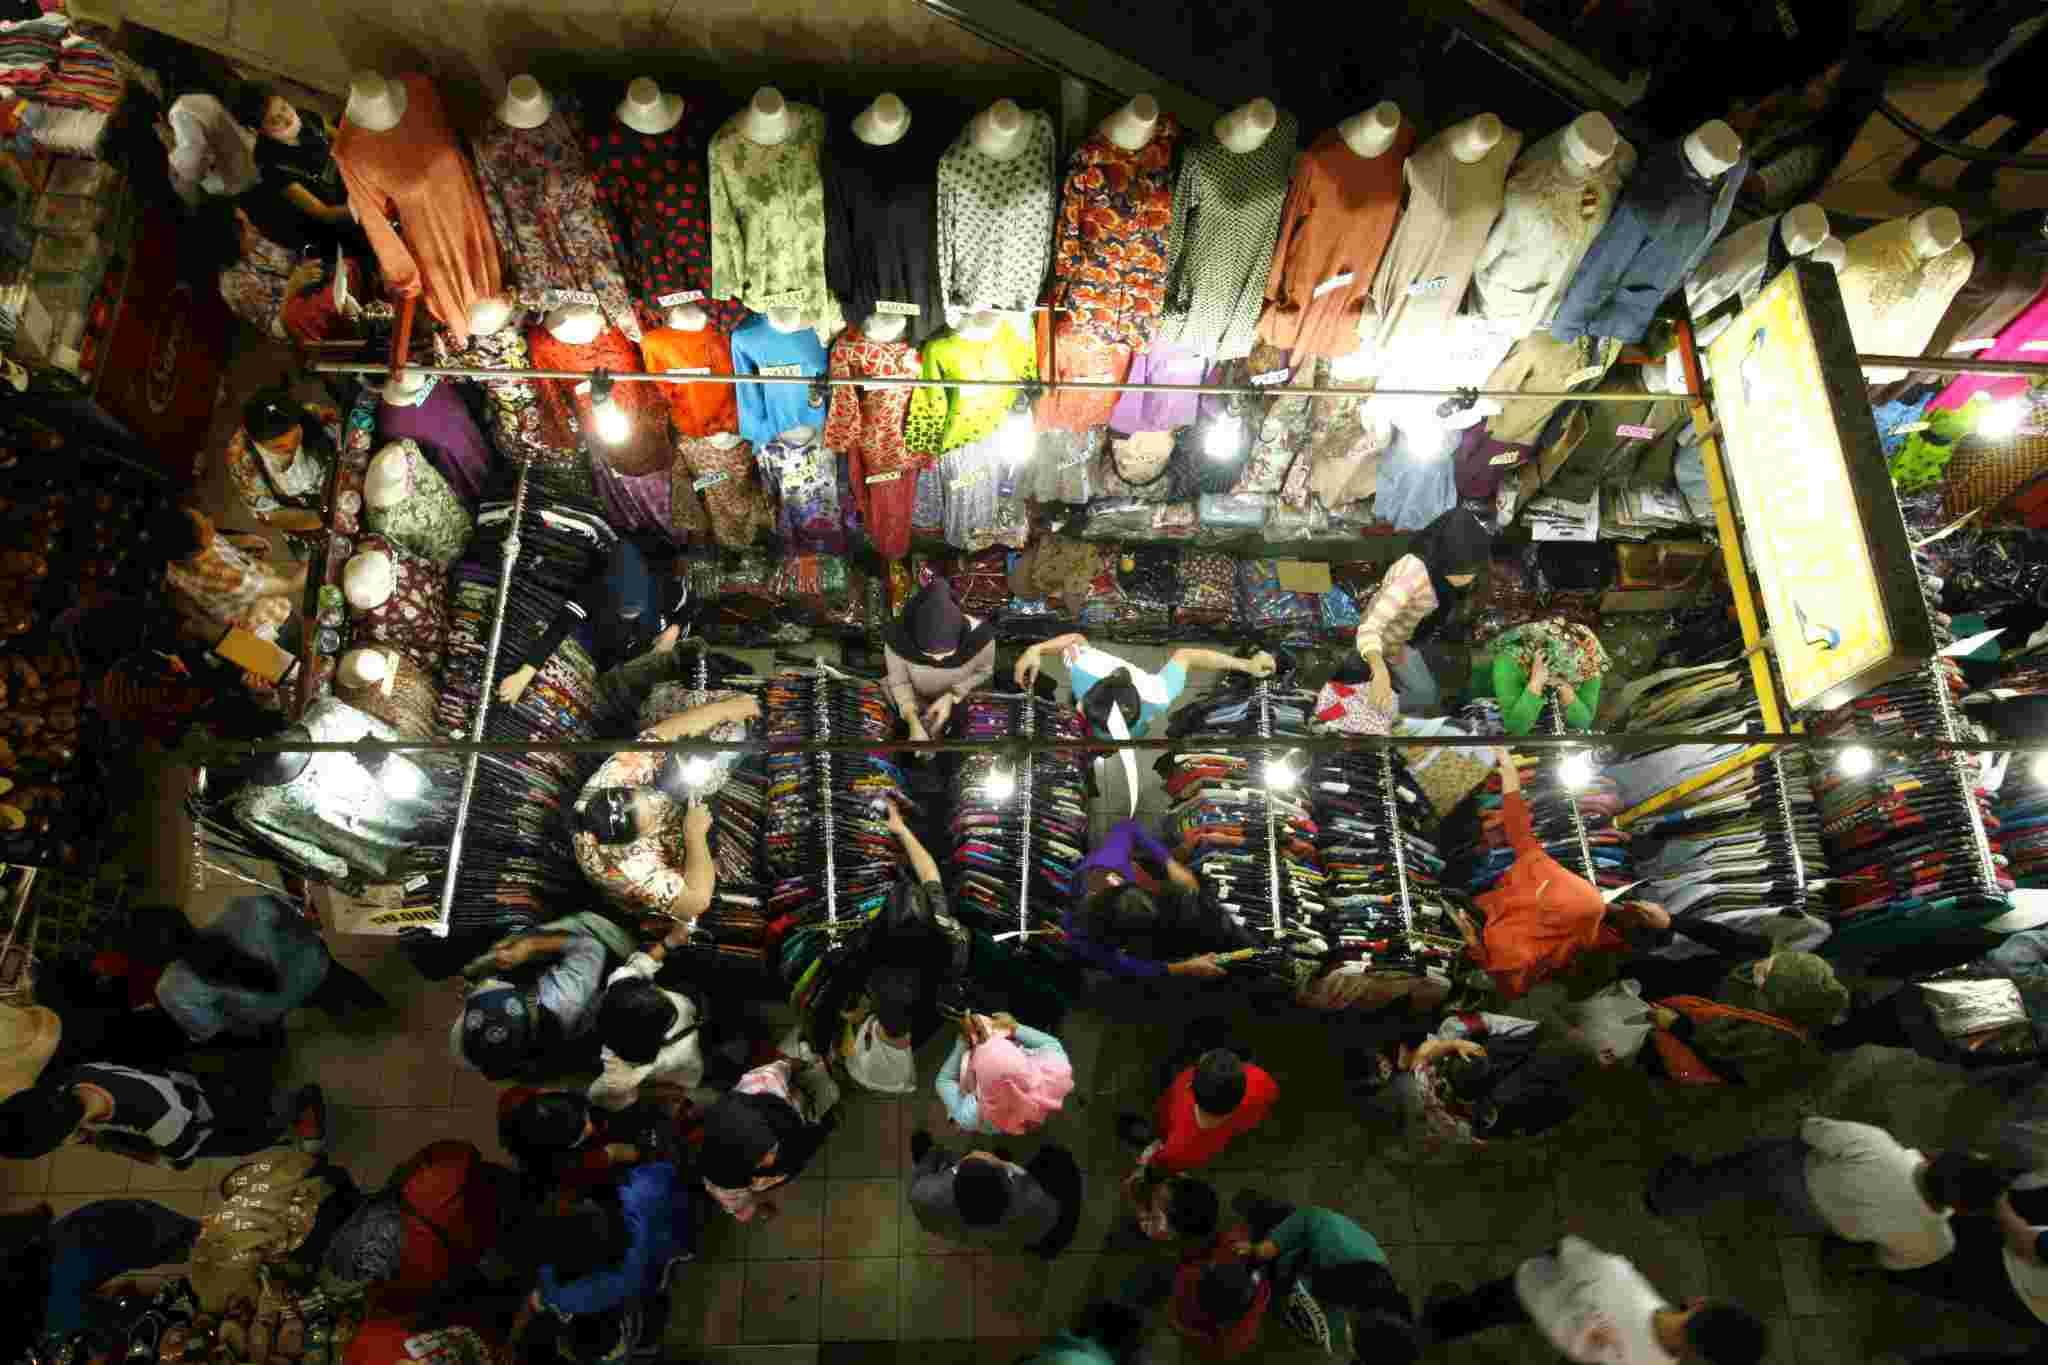 tempat belanja di Pasar Baru Bandung